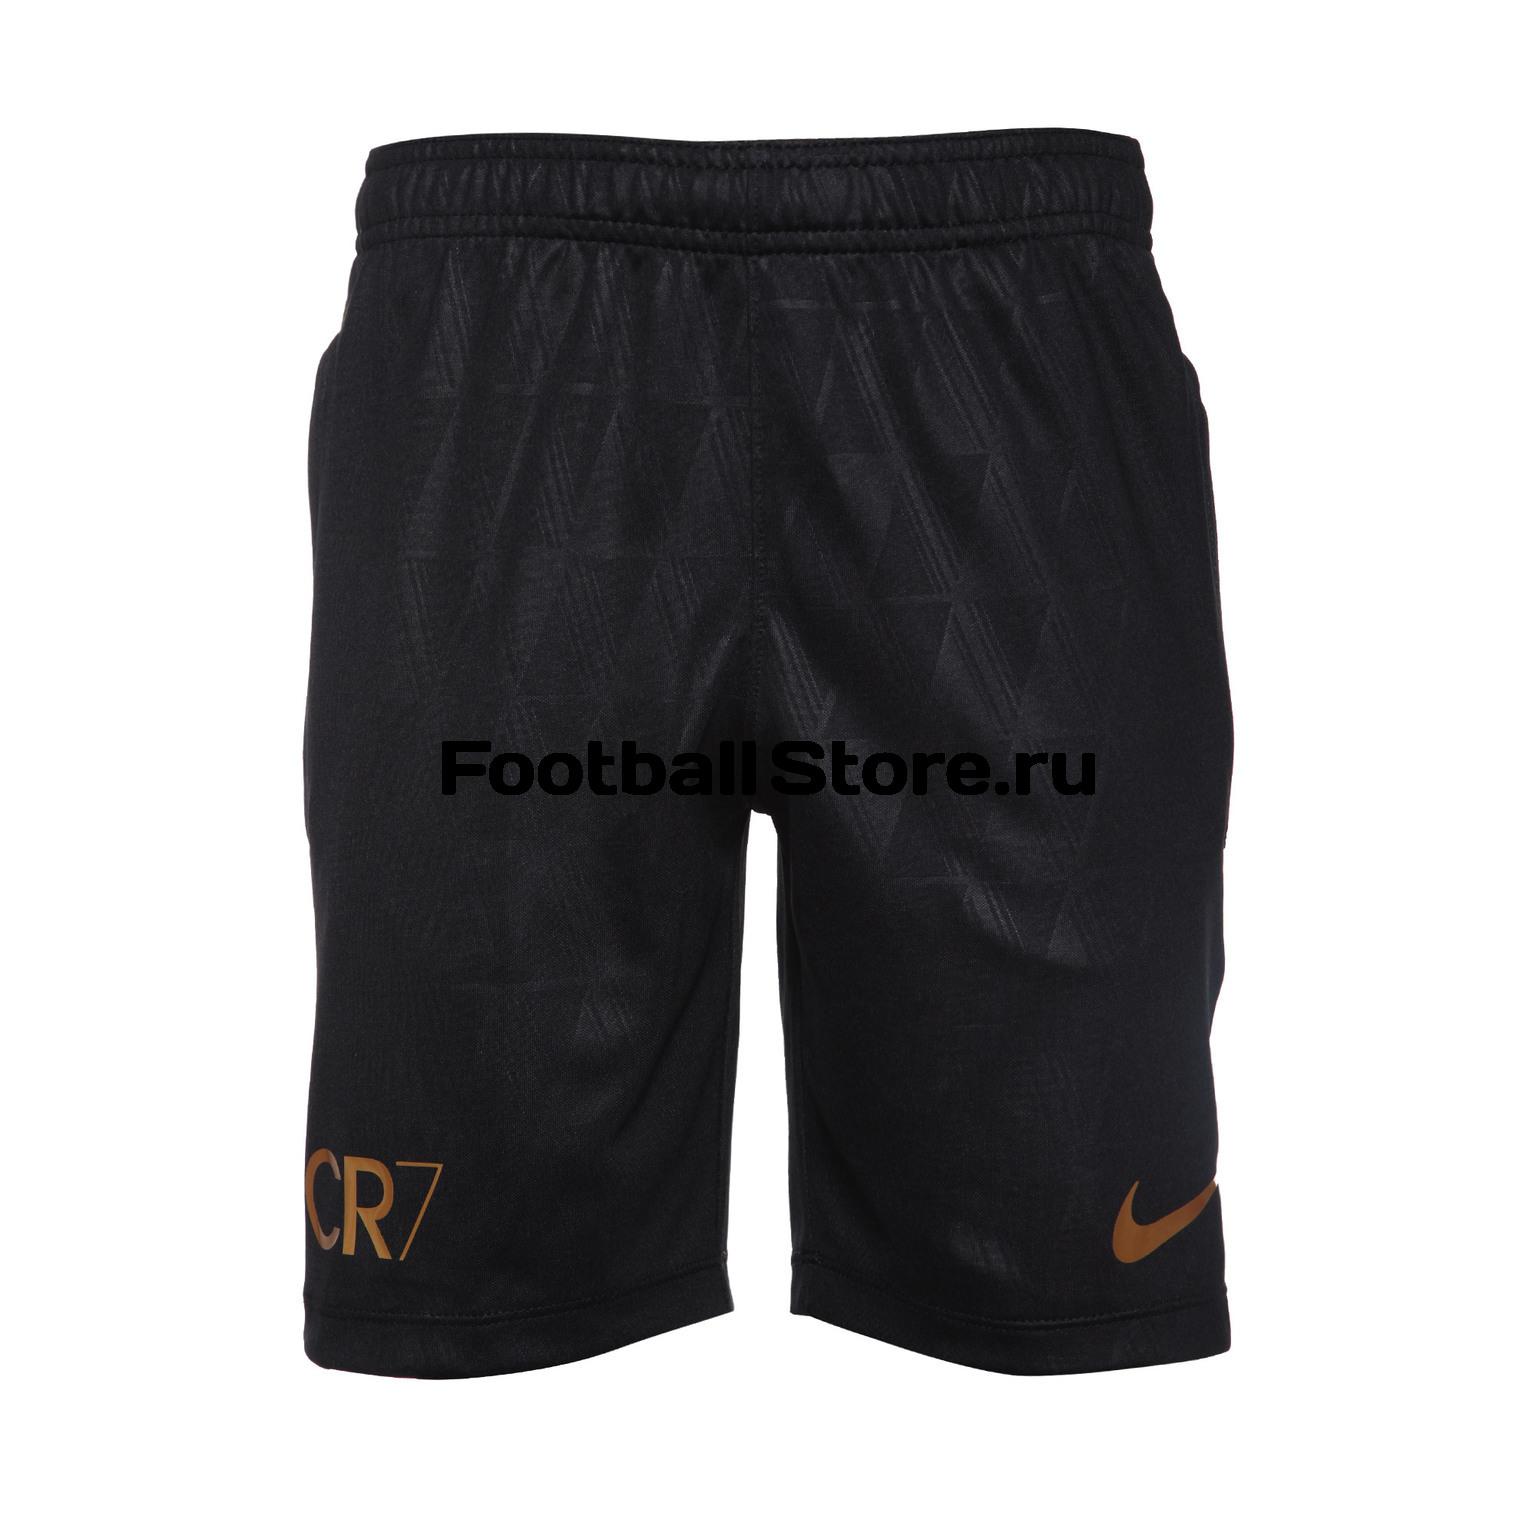 Шорты Nike CR7 Dry Academy 894873-010